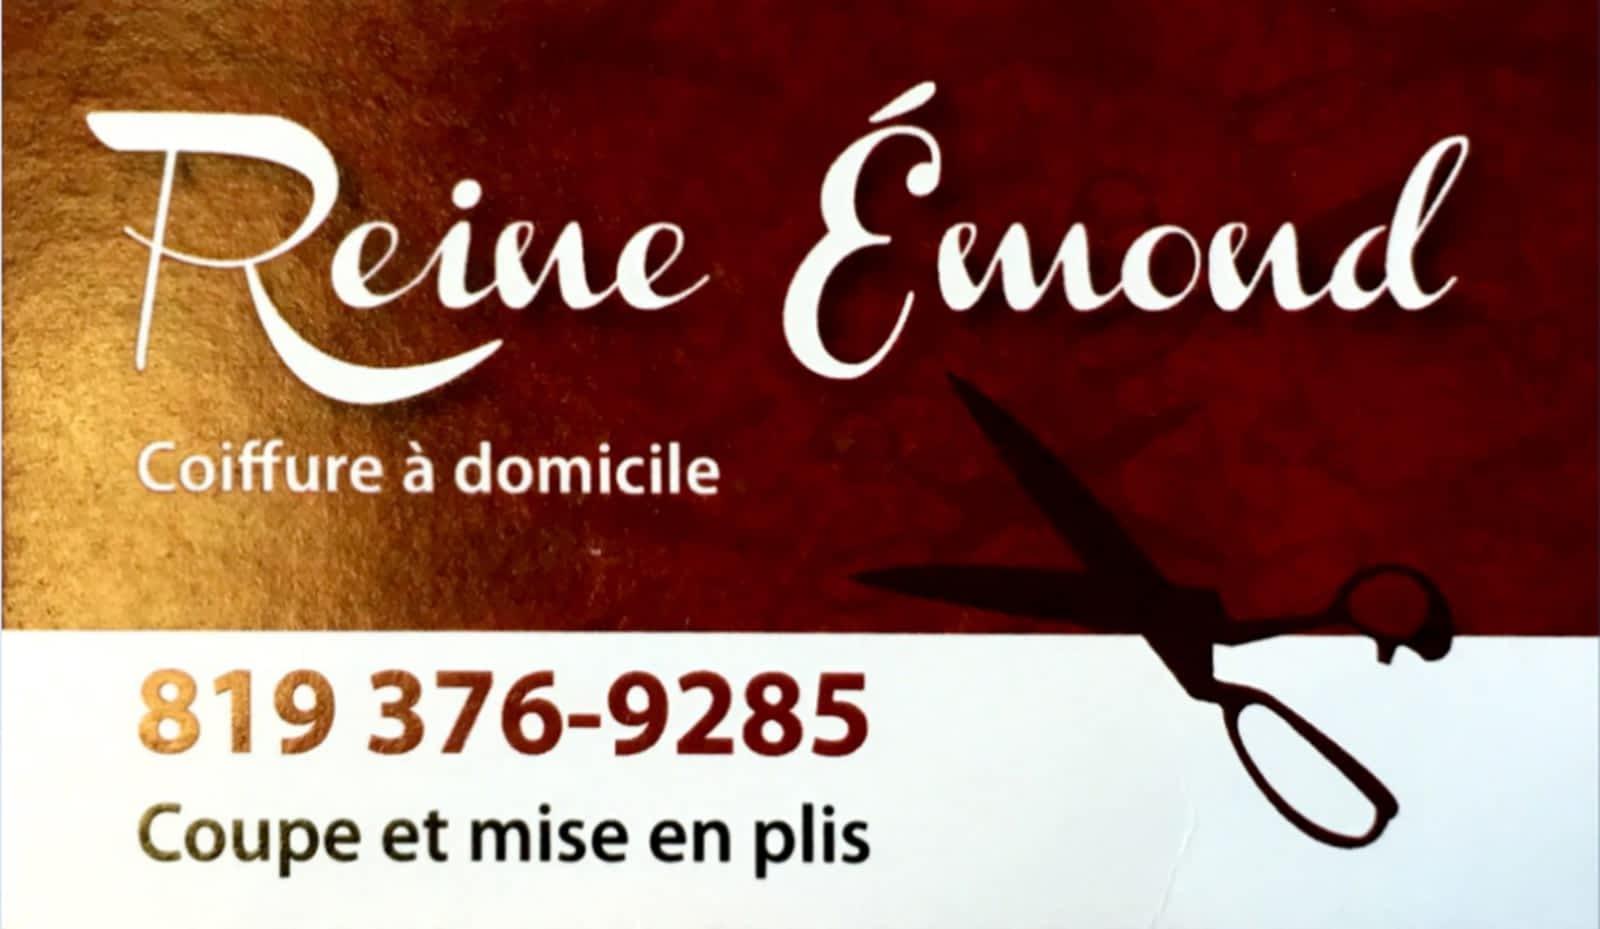 Reine Emond Coiffure A Domicile Opening Hours Trois Riviere Qc